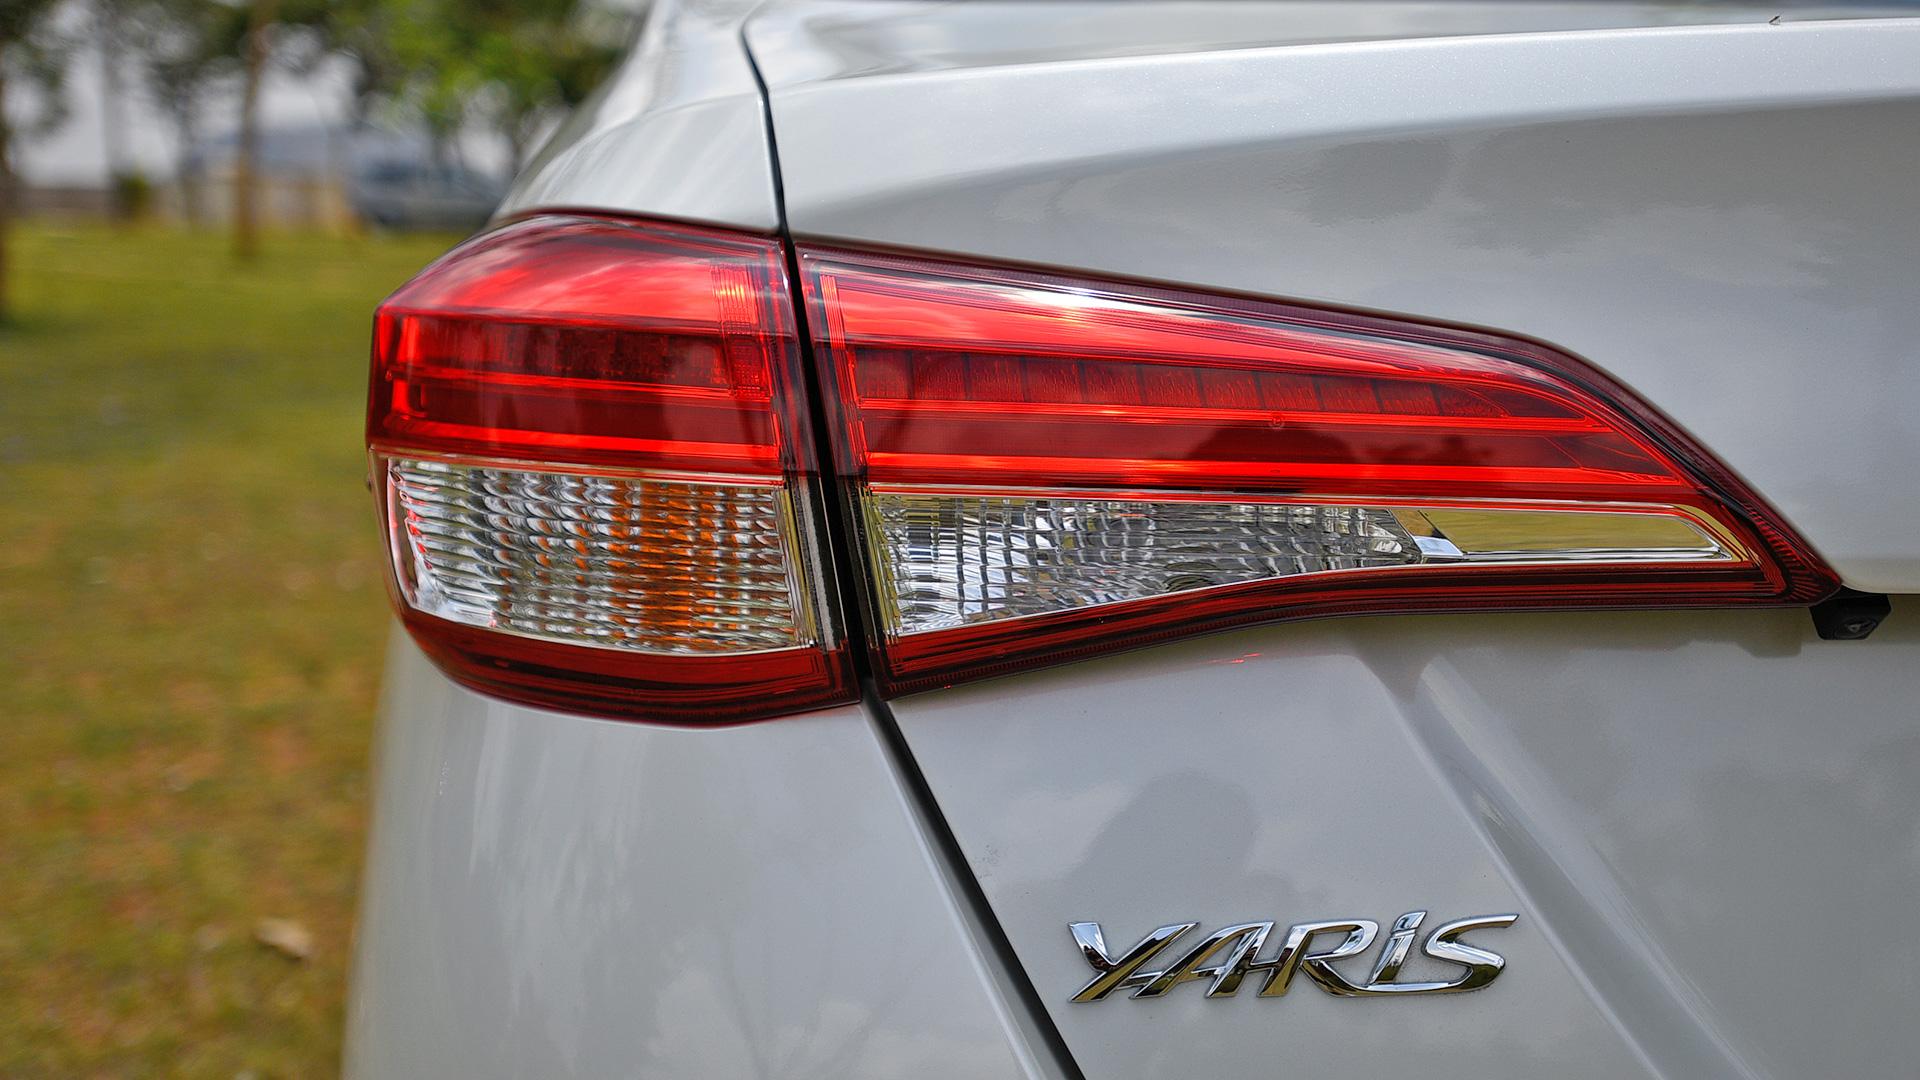 Toyota Yaris 2018 VX CVT Exterior